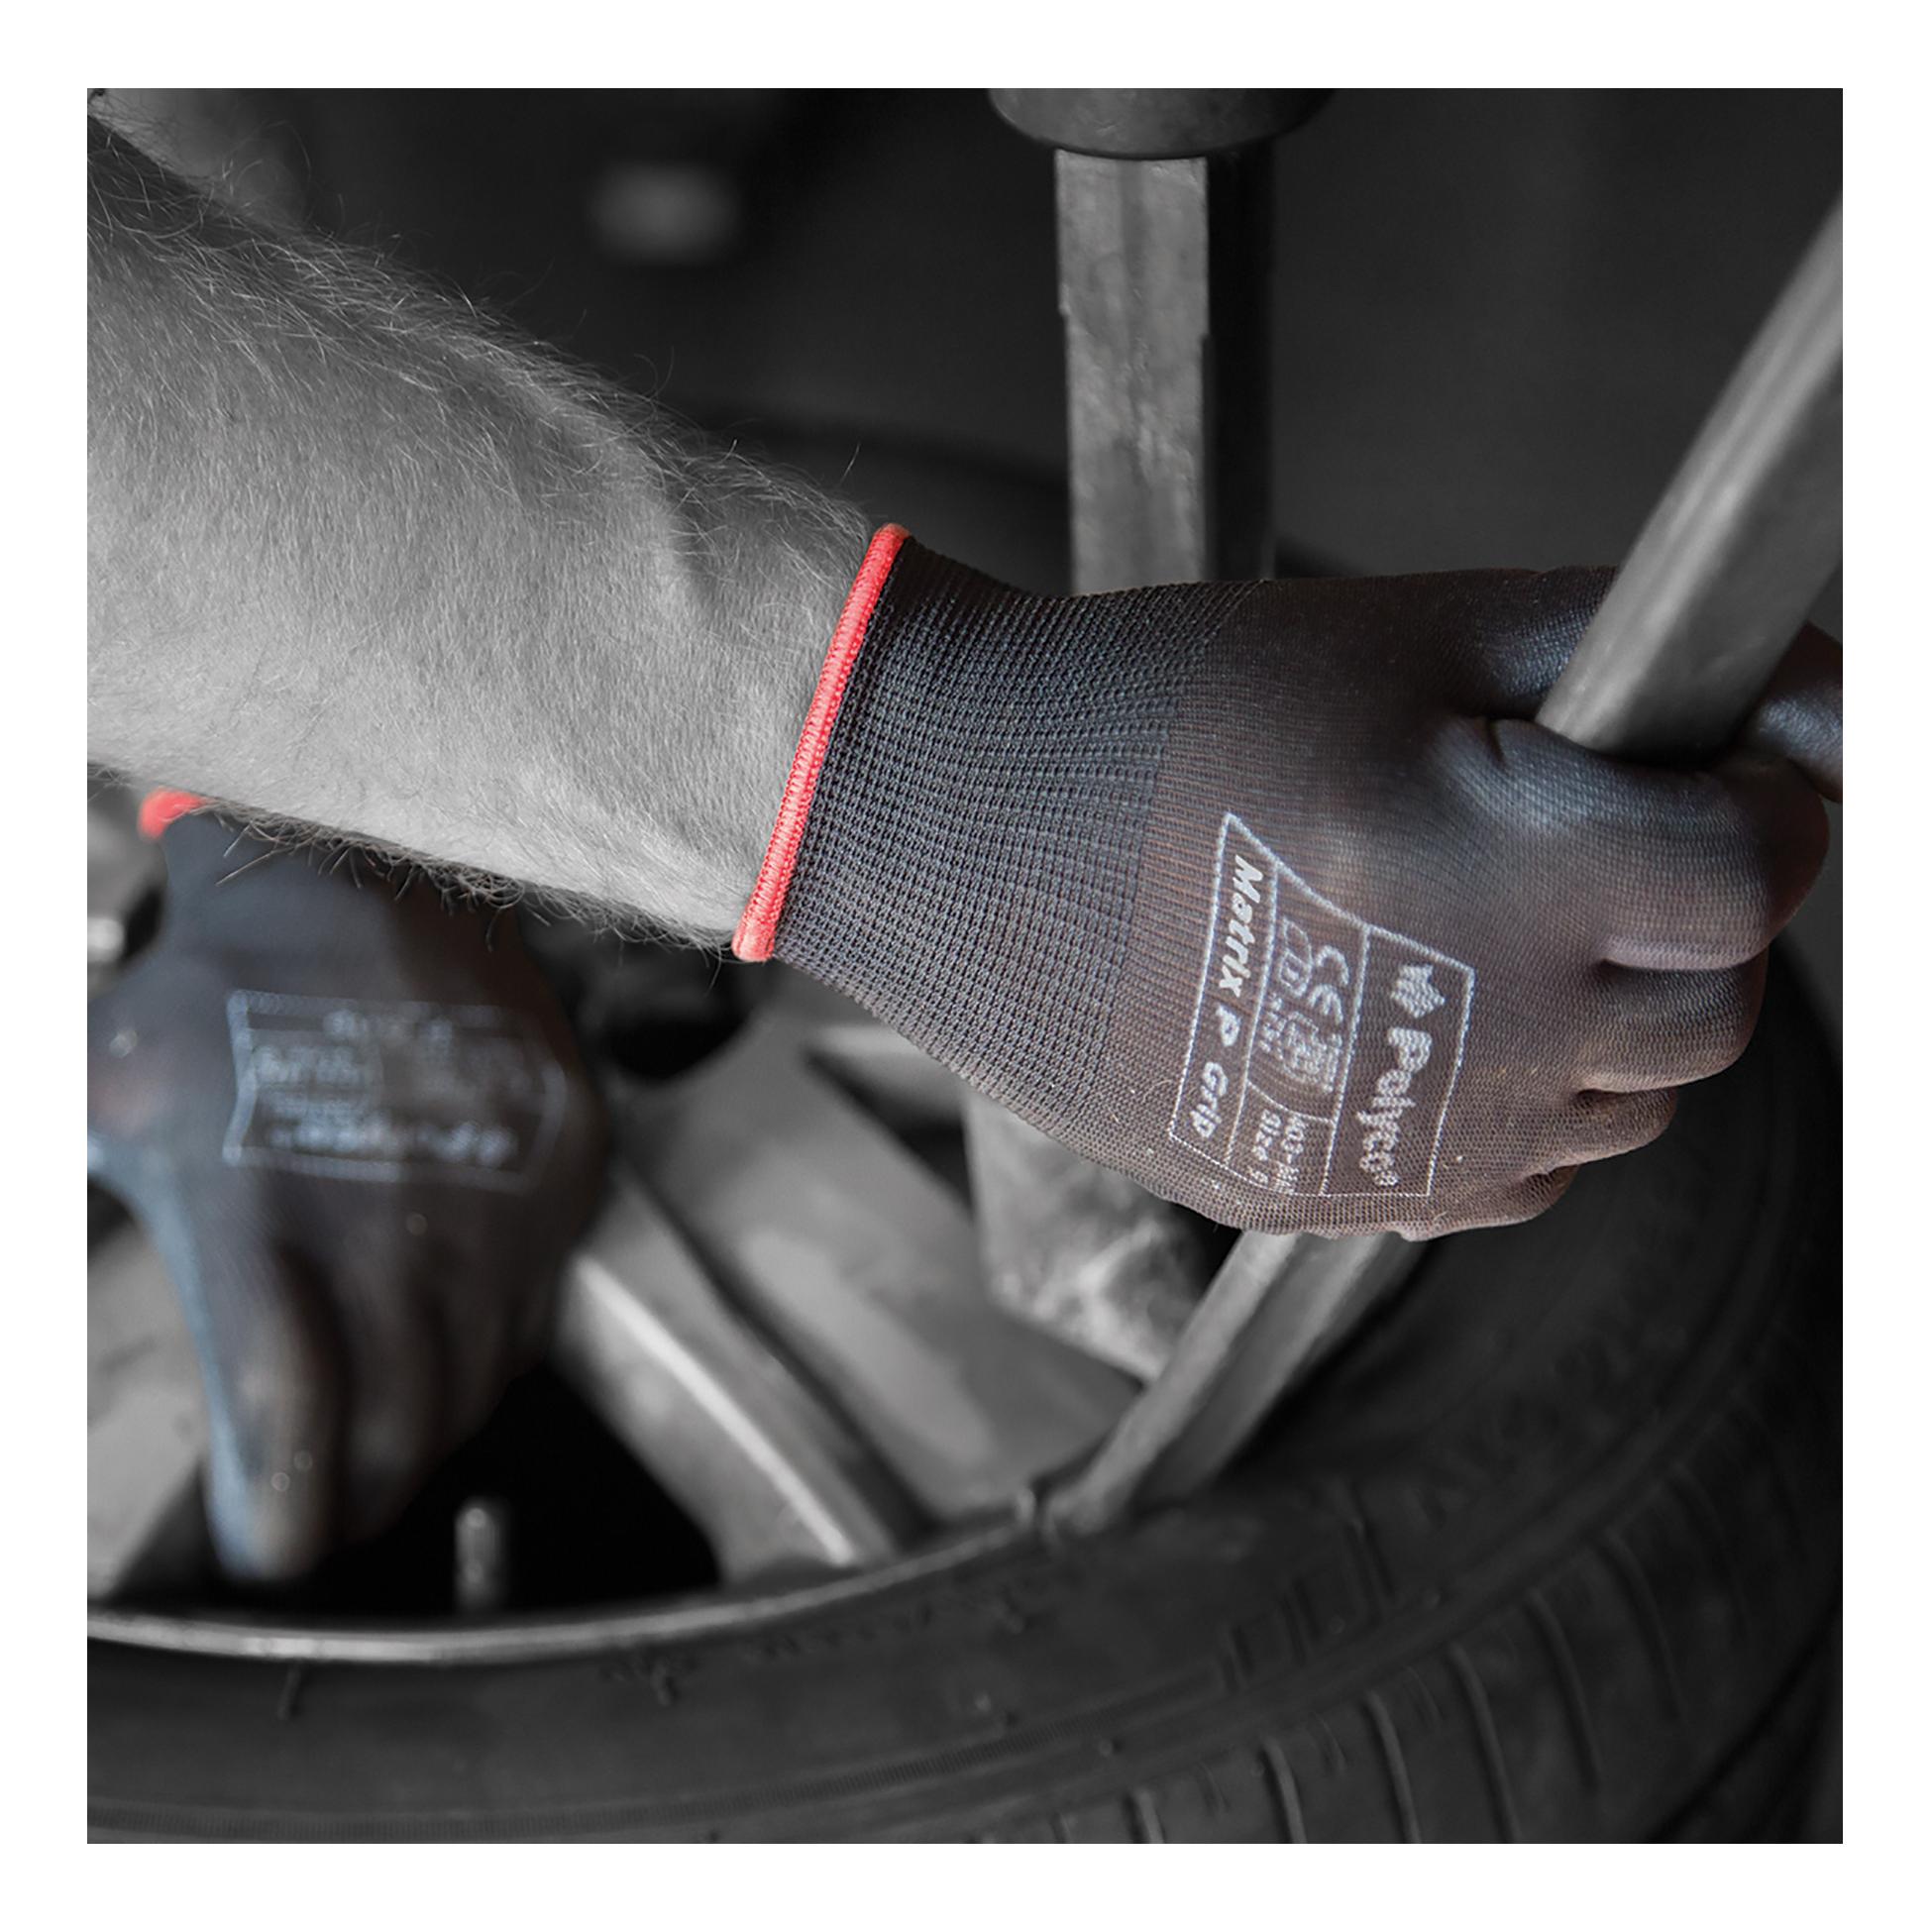 Polyco Matrix P Grip Gloves Polyurethane Tight-fit Size 9 Black Ref 403-MAT